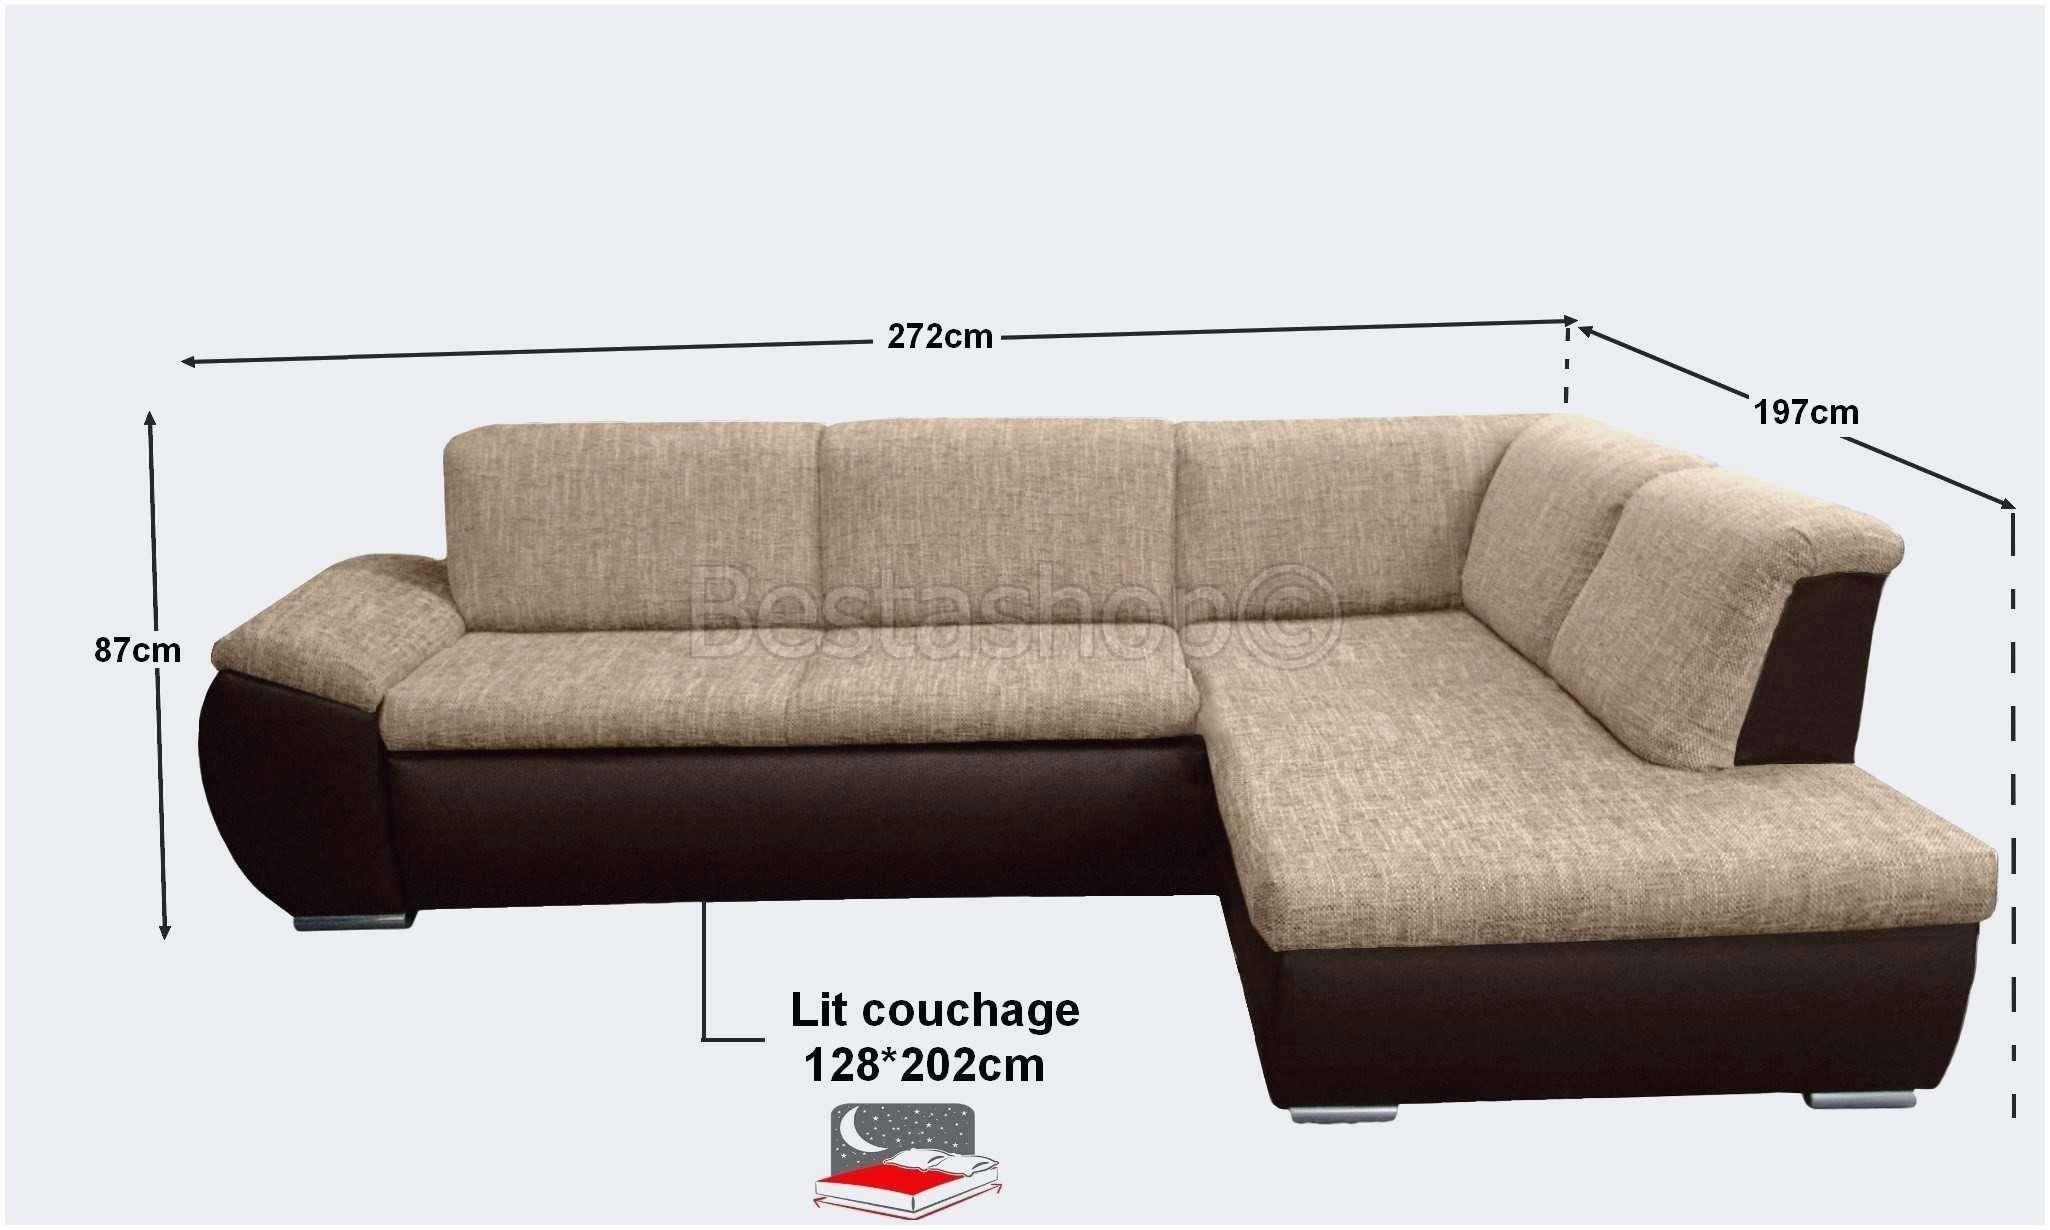 Canapé Lit En Cuir Beau Elégant Canapé Angle Habitat Luxe S Canap Simili Cuir Marron 27 C3